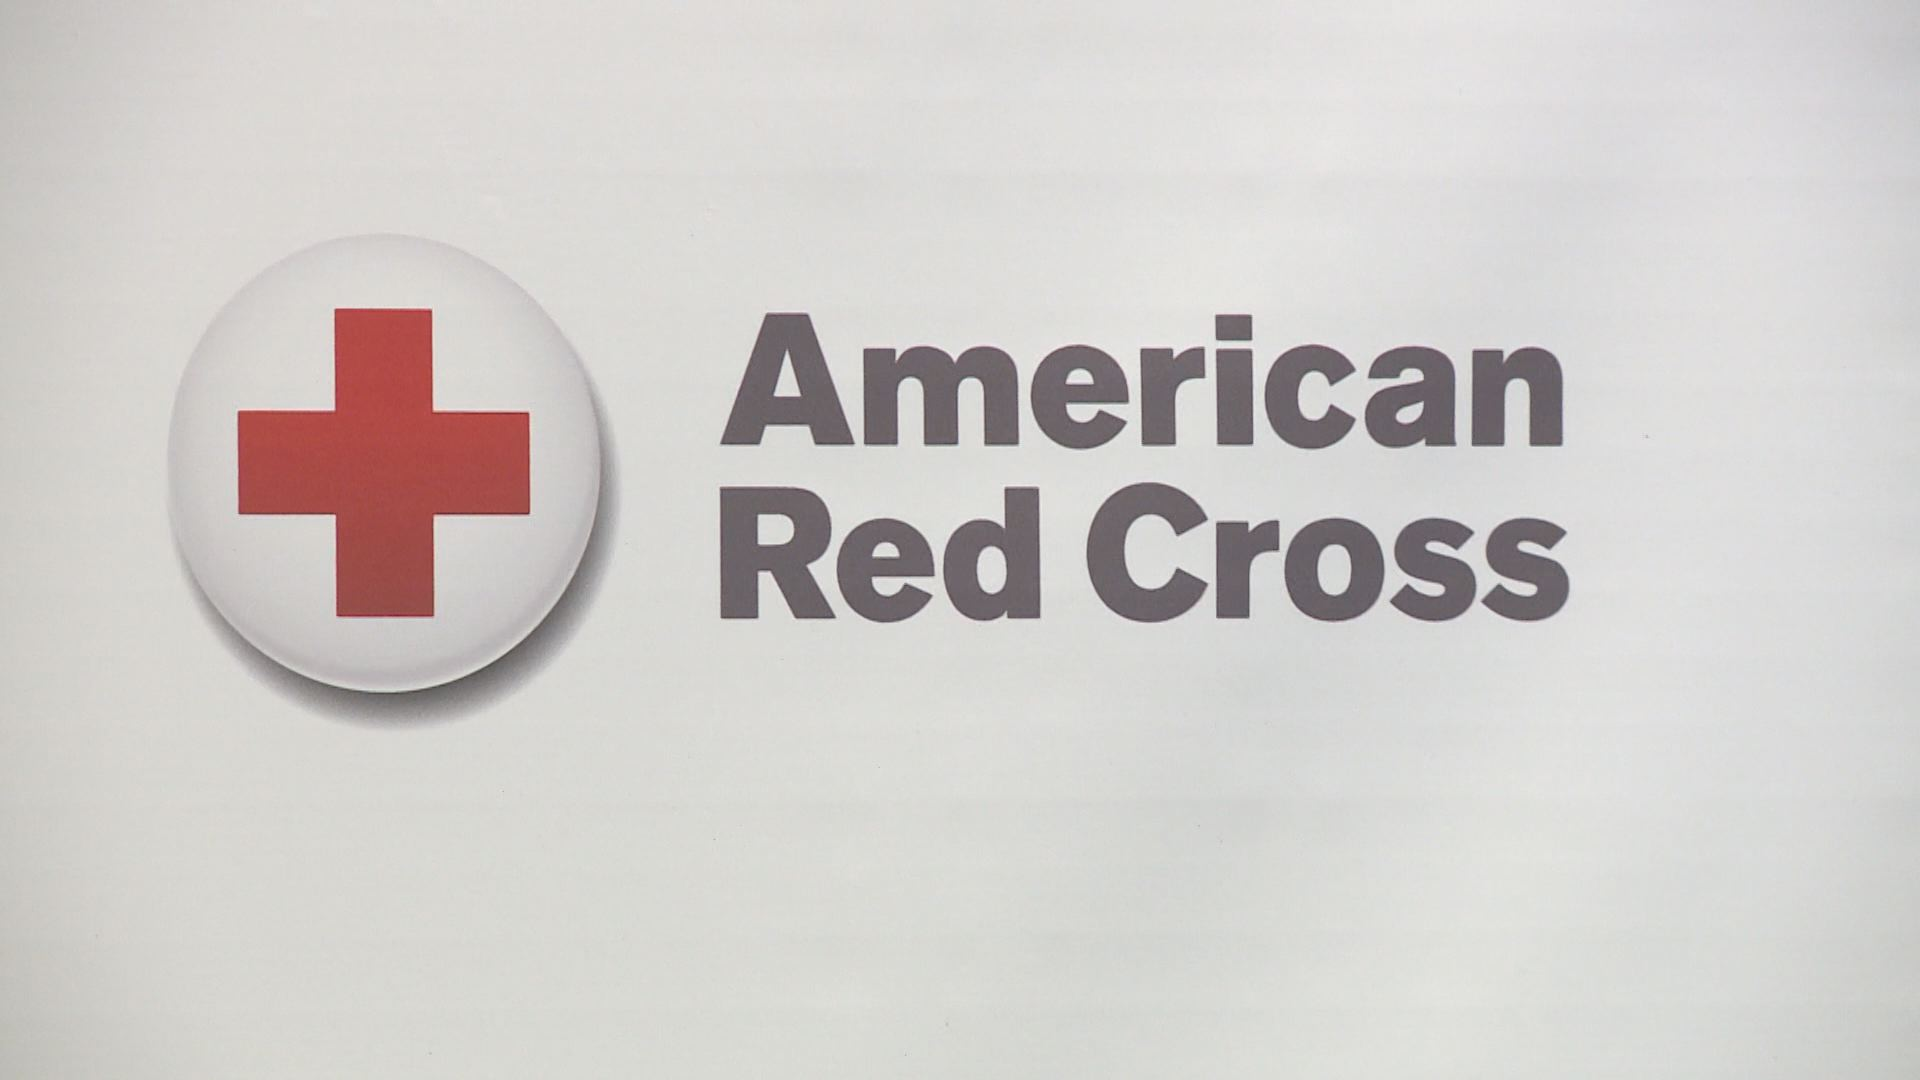 American Red Cross_1525203736530.jpg.jpg